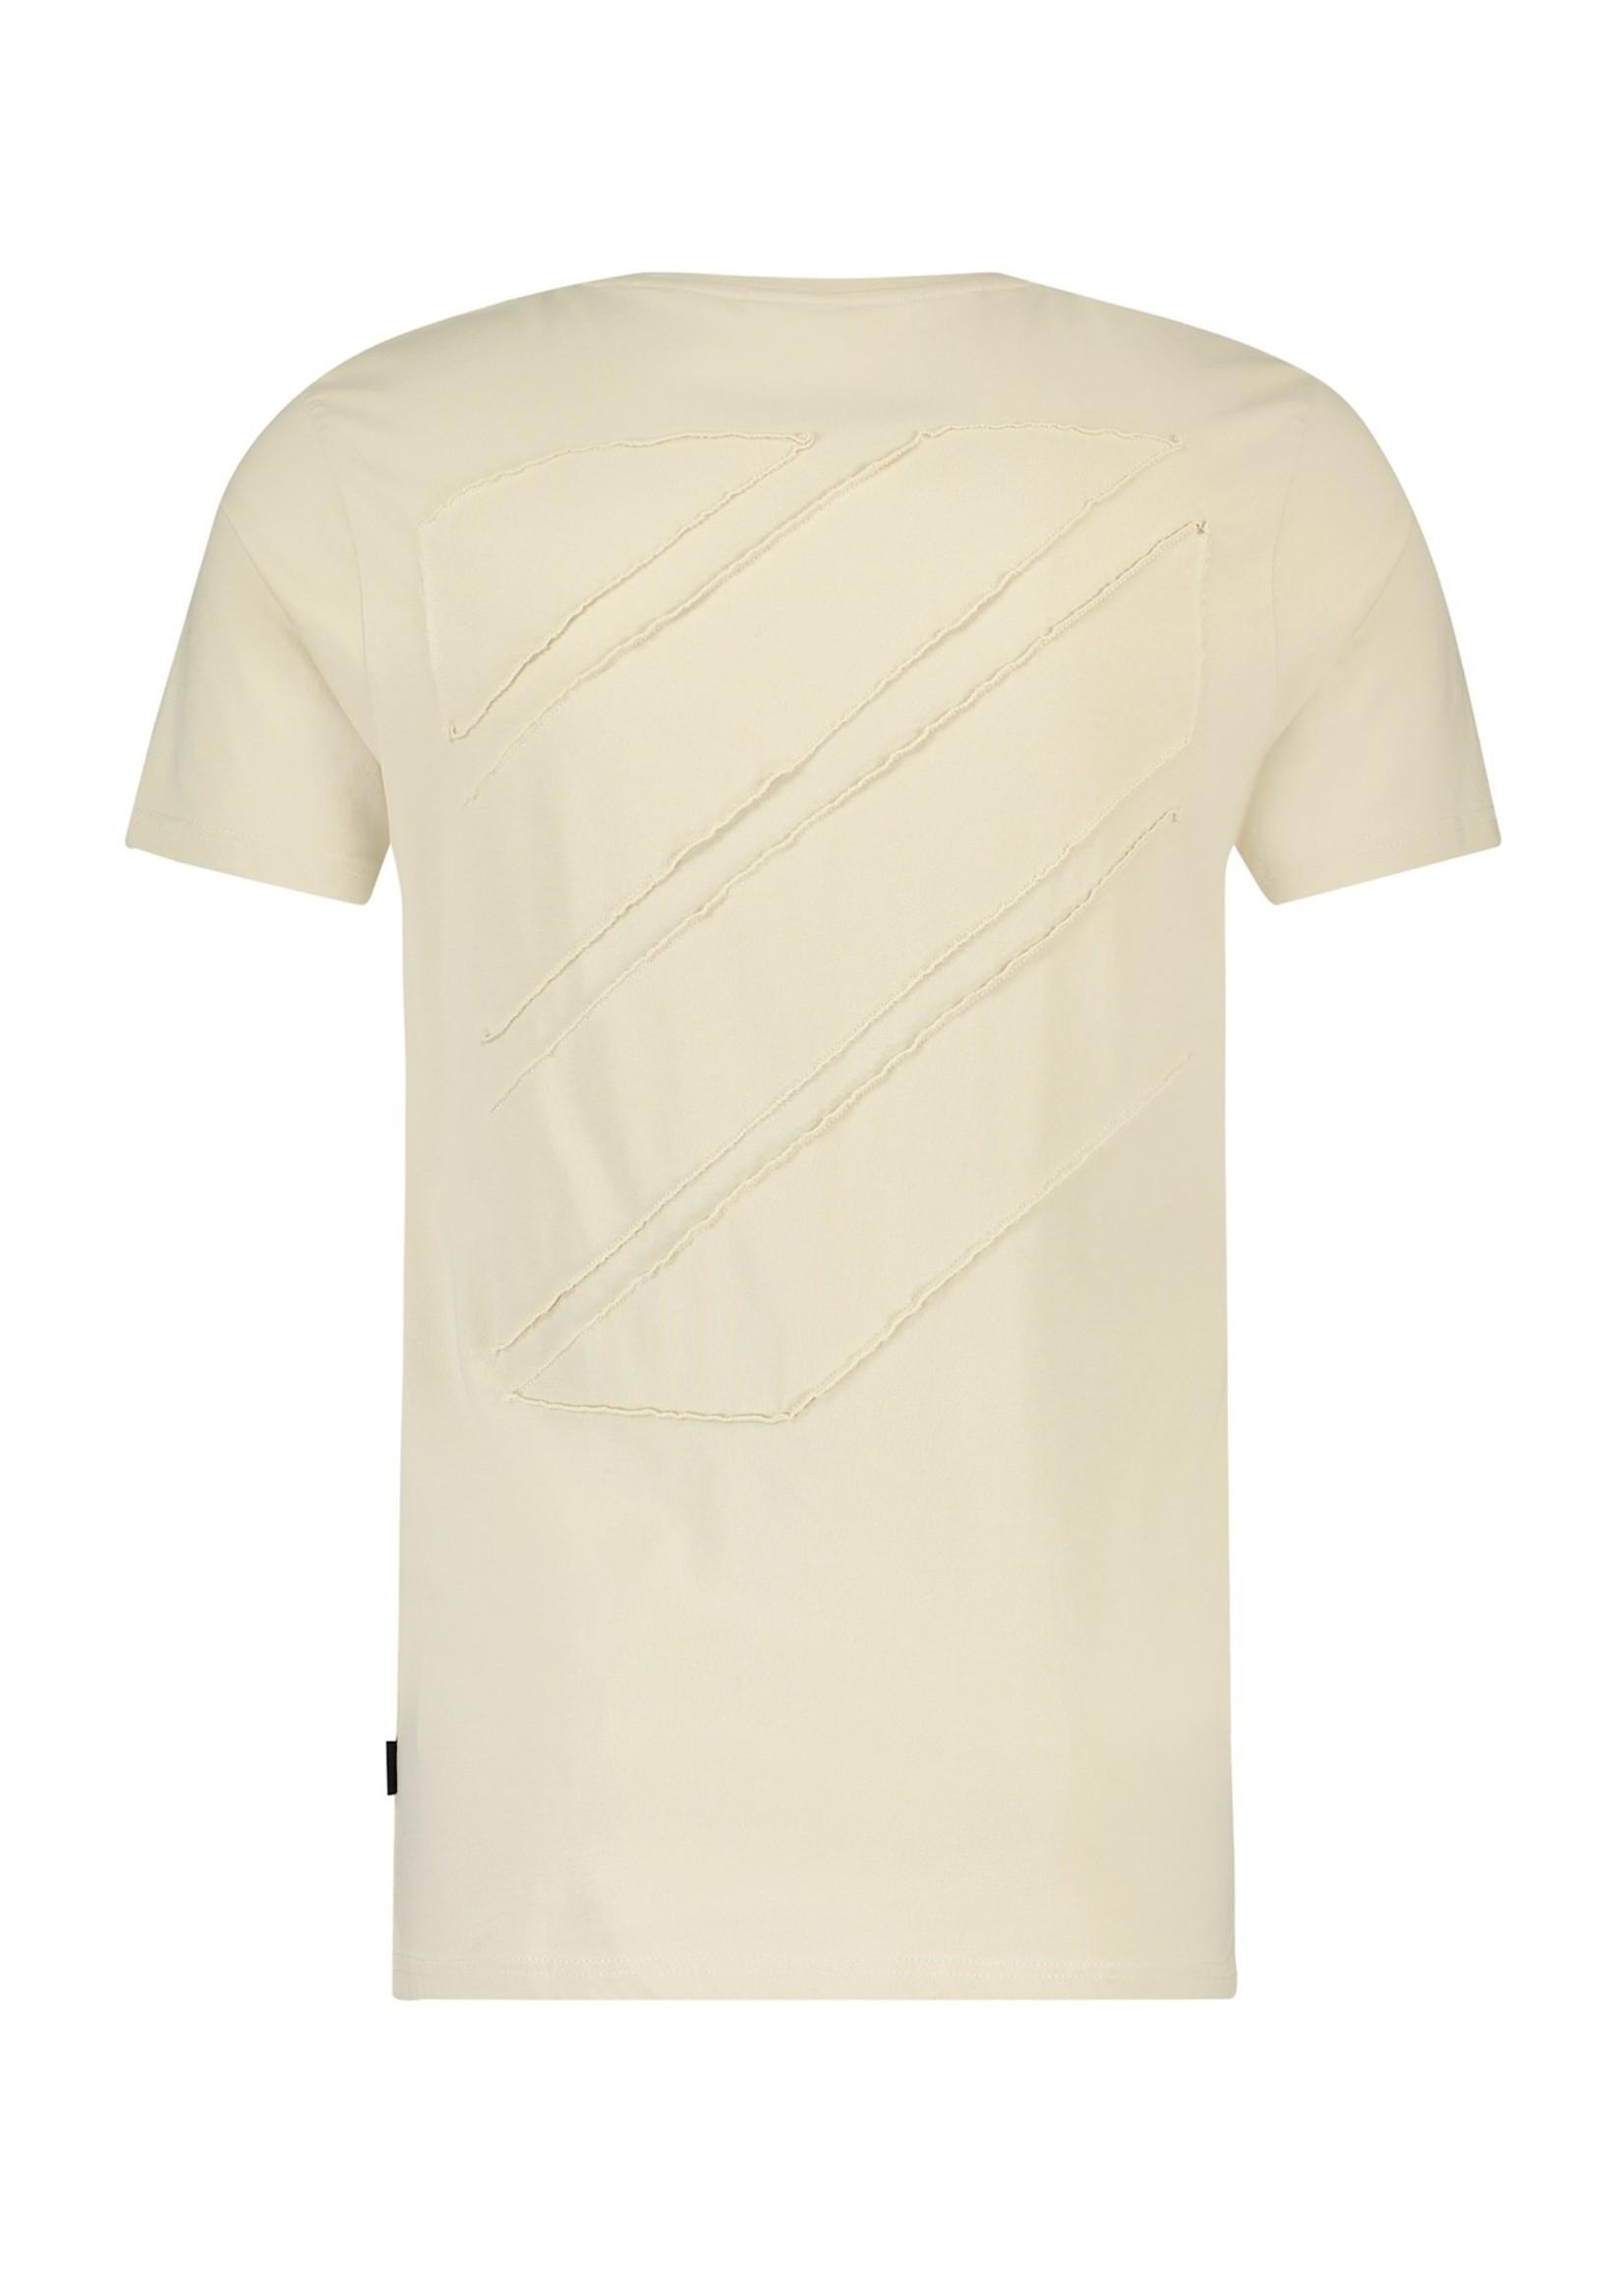 Purewhite Side Logo - Sand